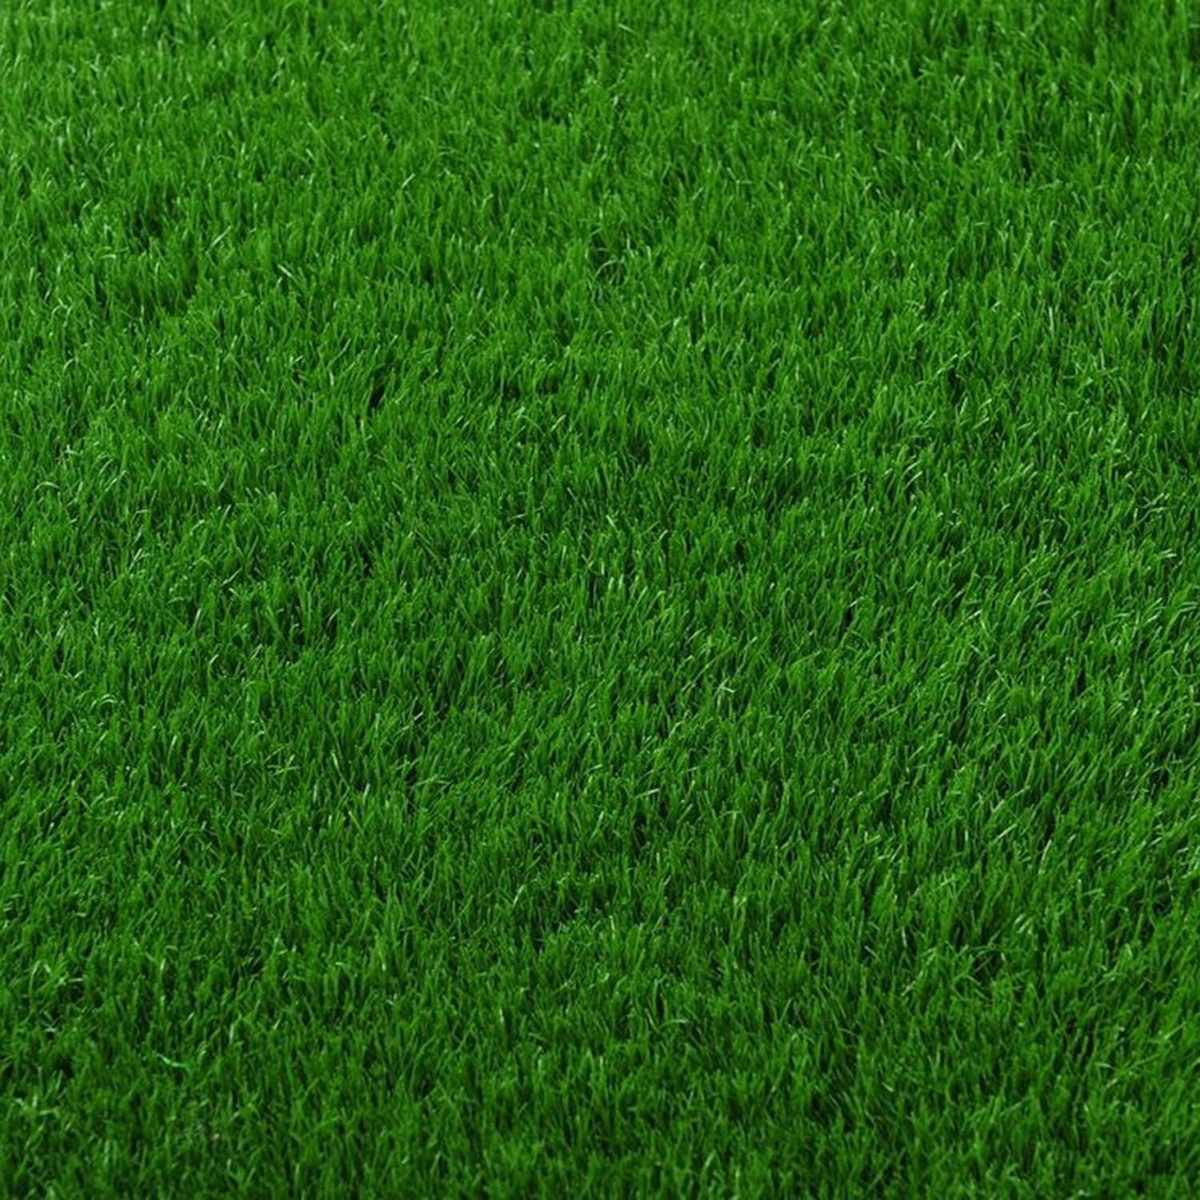 grama sintetica para jardim mercadolivre:Tapete De Grama Sintetica Artificial 2x1m – R$ 63,70 em Mercado Livre